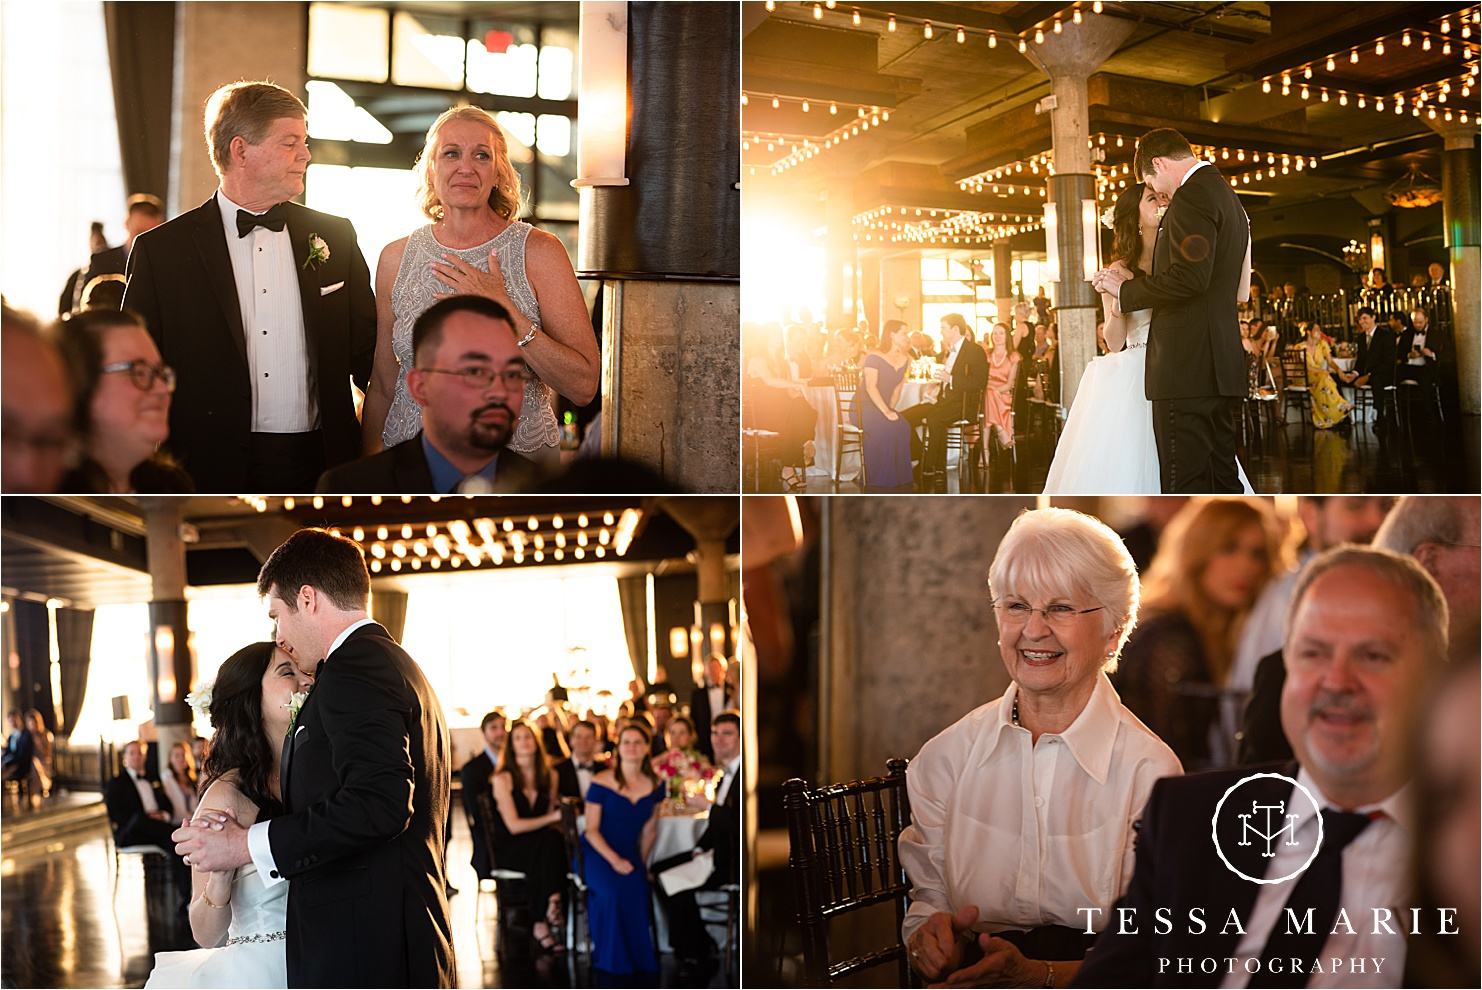 Tessa_marie_weddings_houston_wedding_photographer_The_astorian_0150.jpg